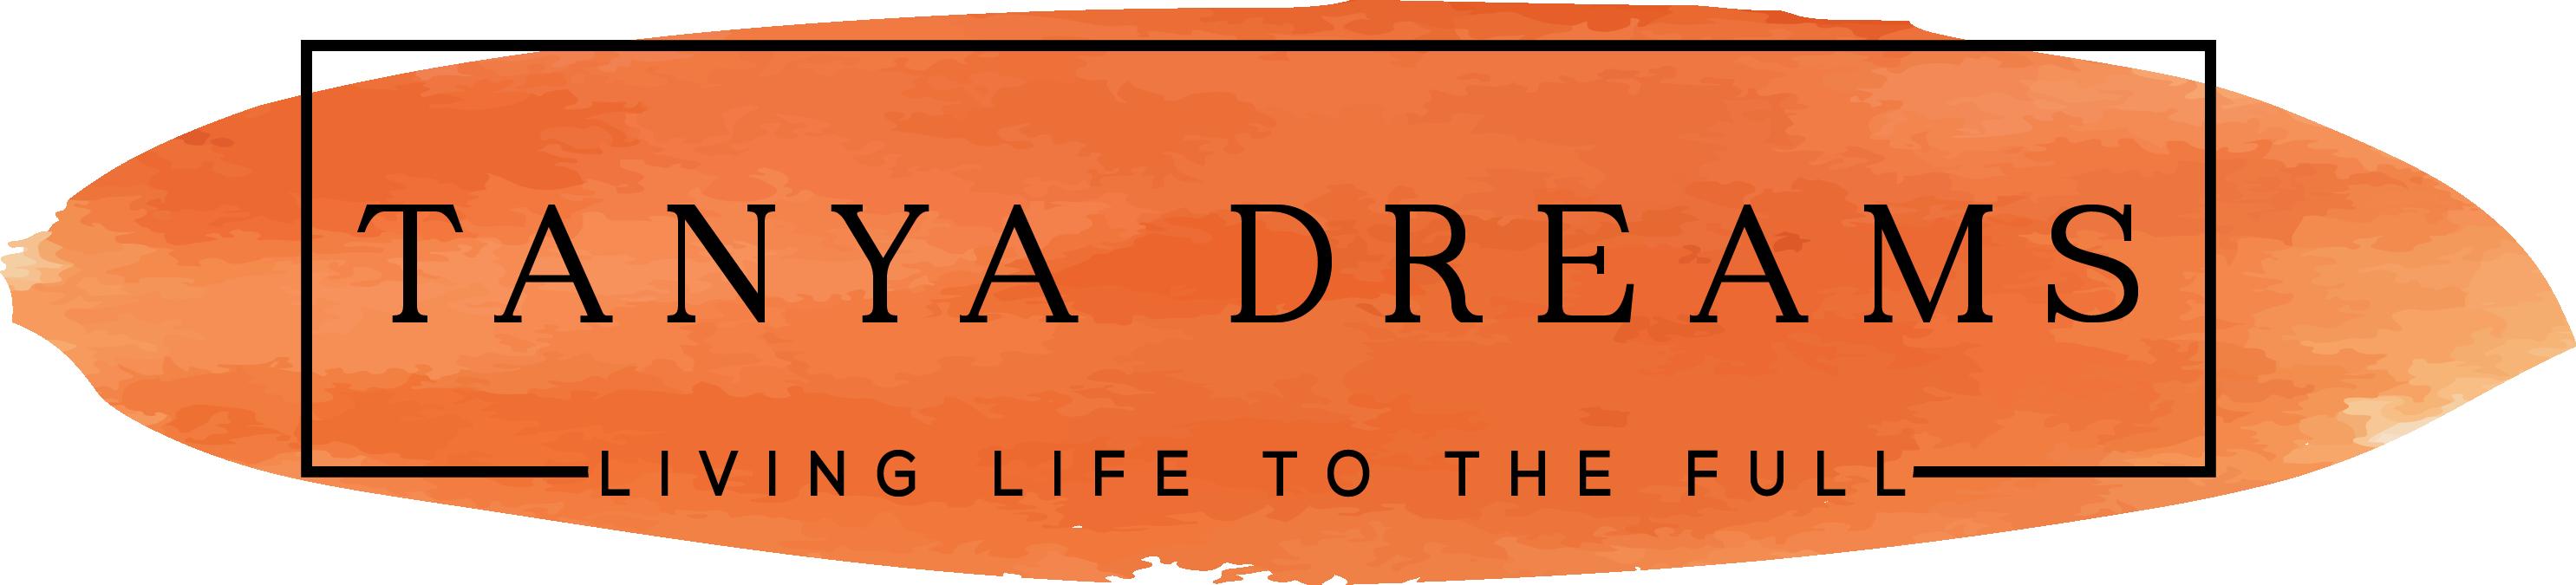 Tanya Dreams